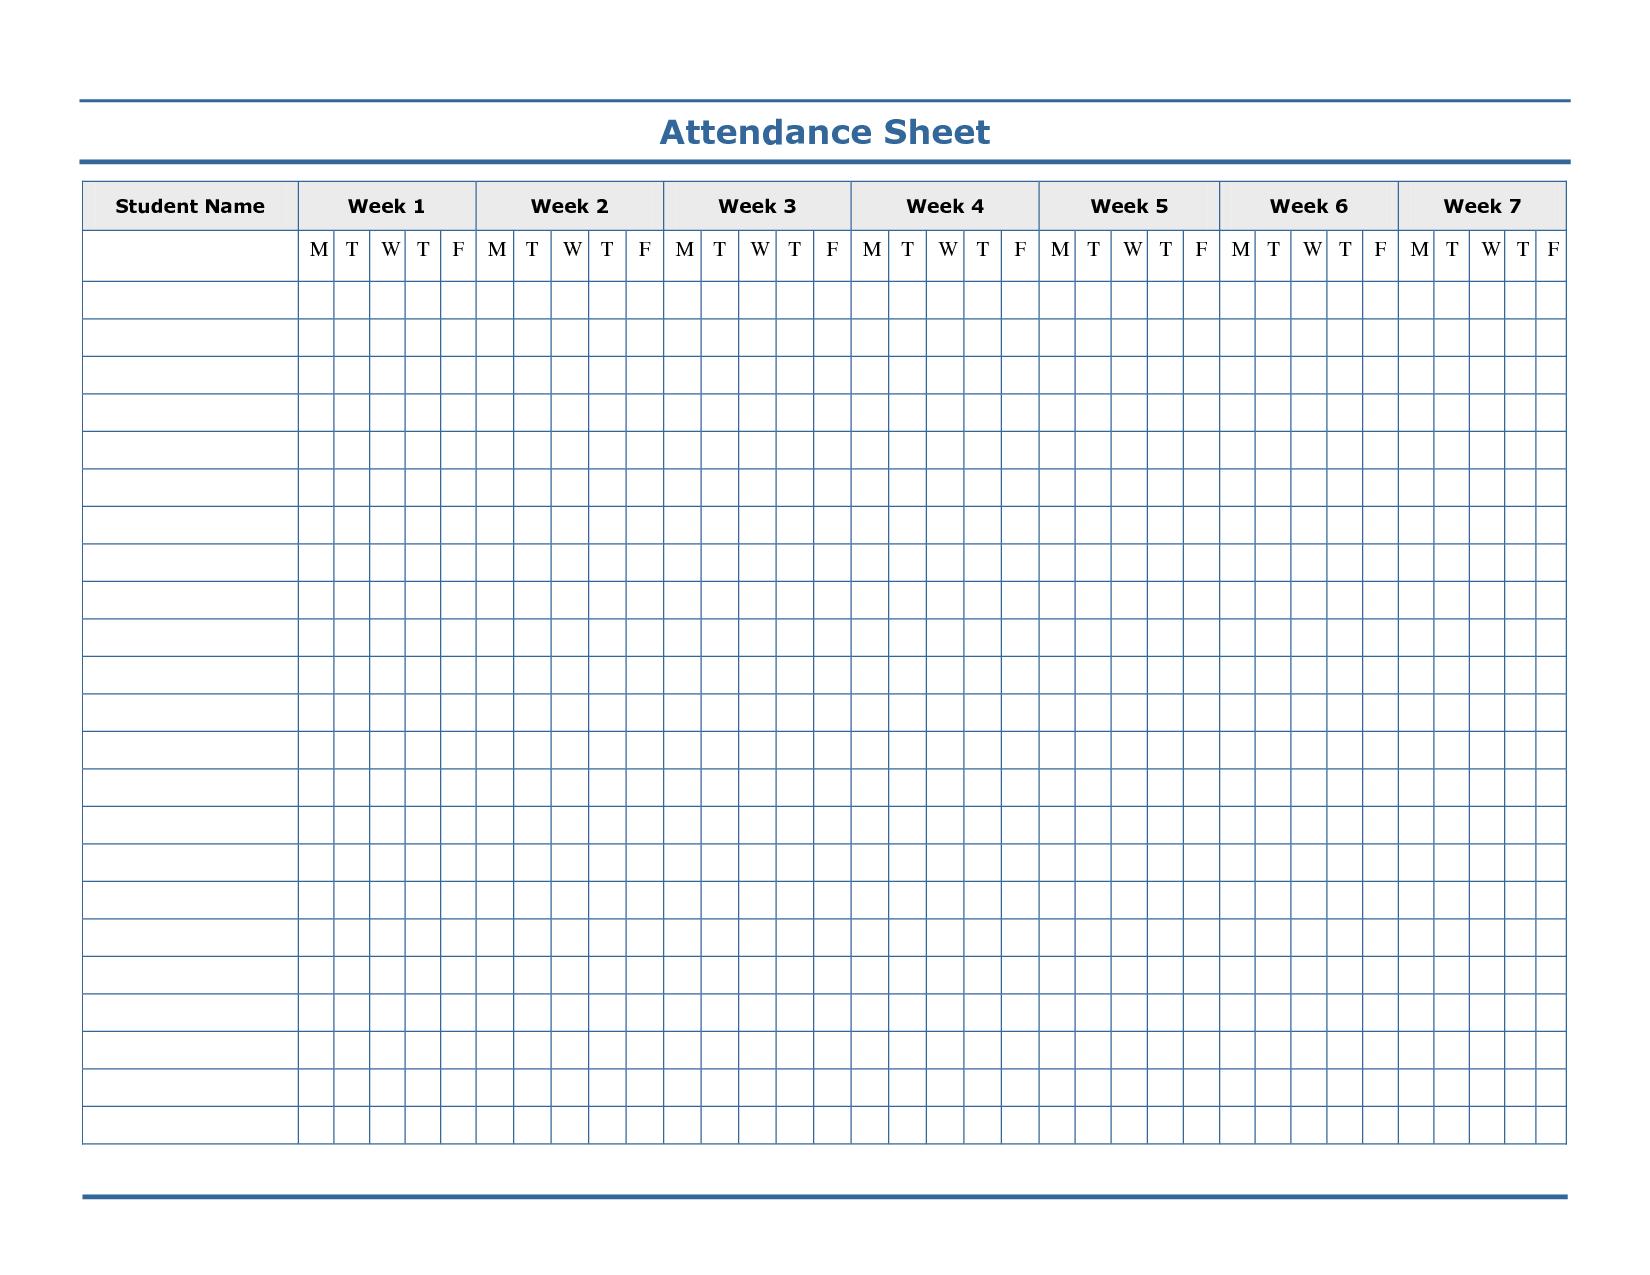 Free Printable Blank Attendance Sheets  Attendance Sheet